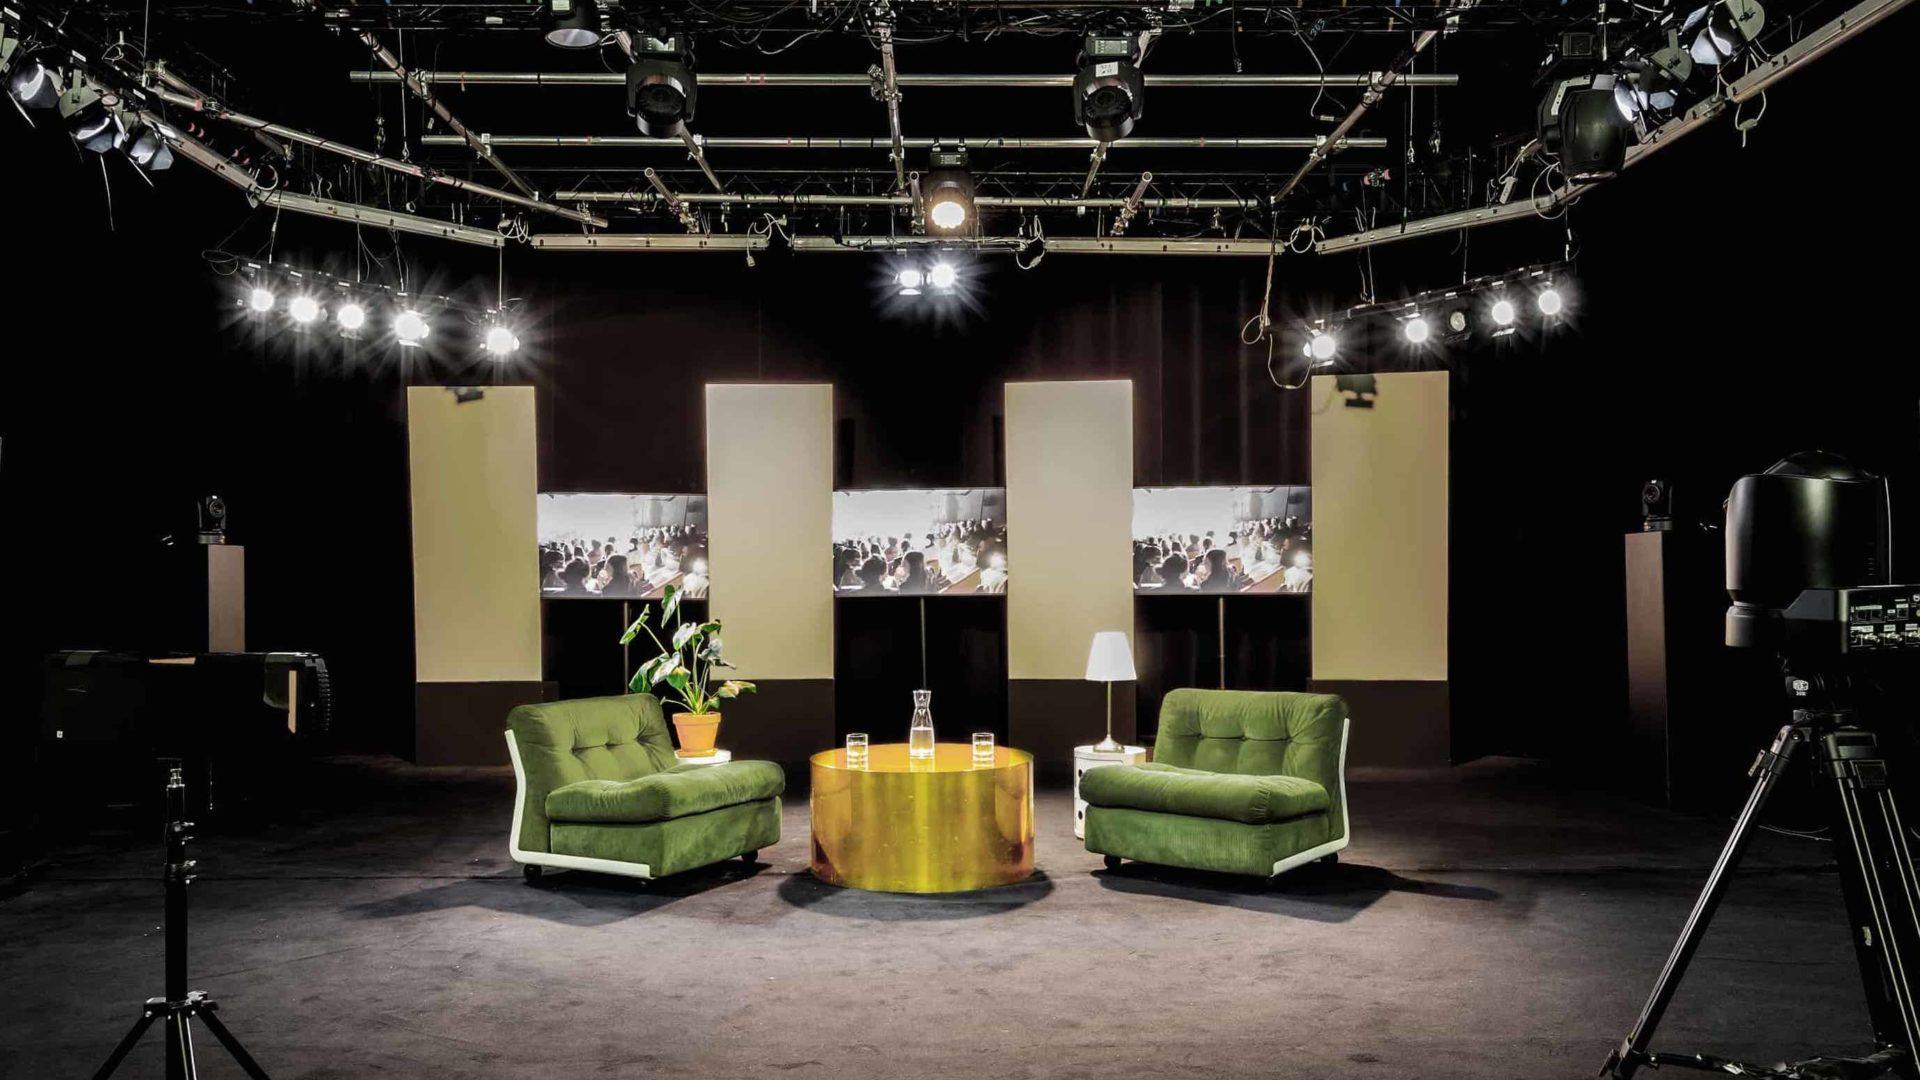 Studio de tournage